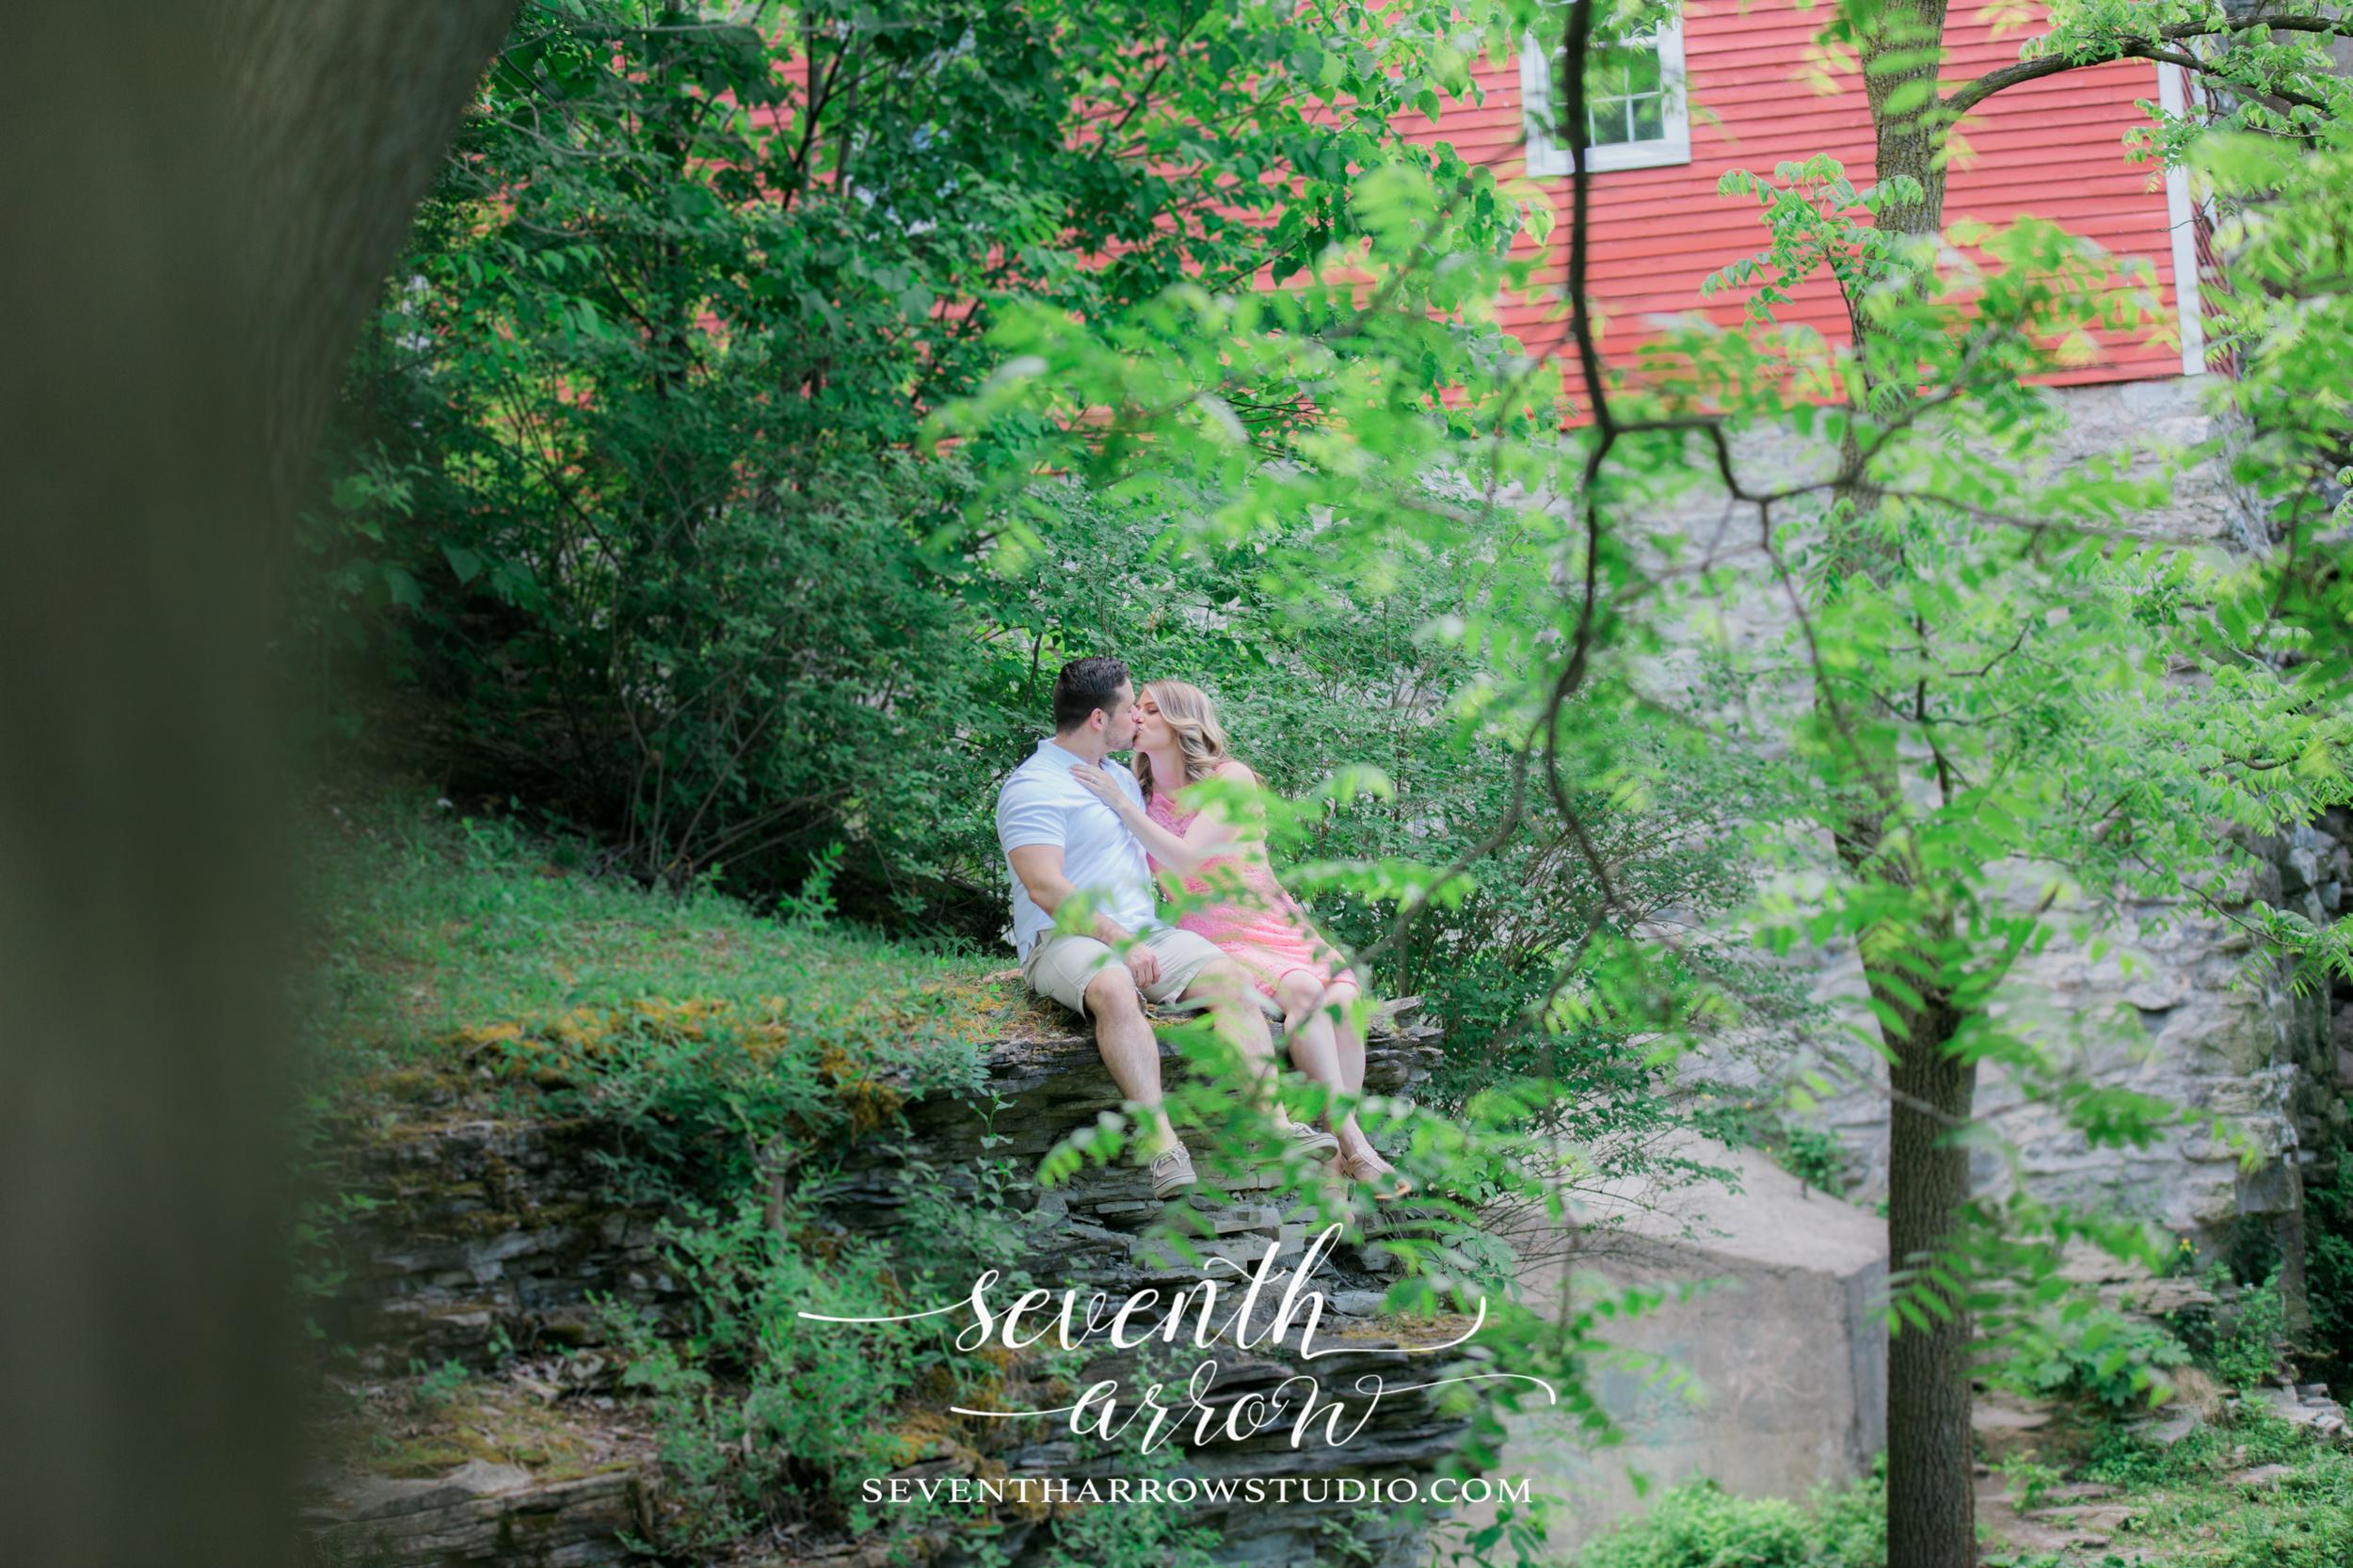 Alicia and Paul-7551.jpg